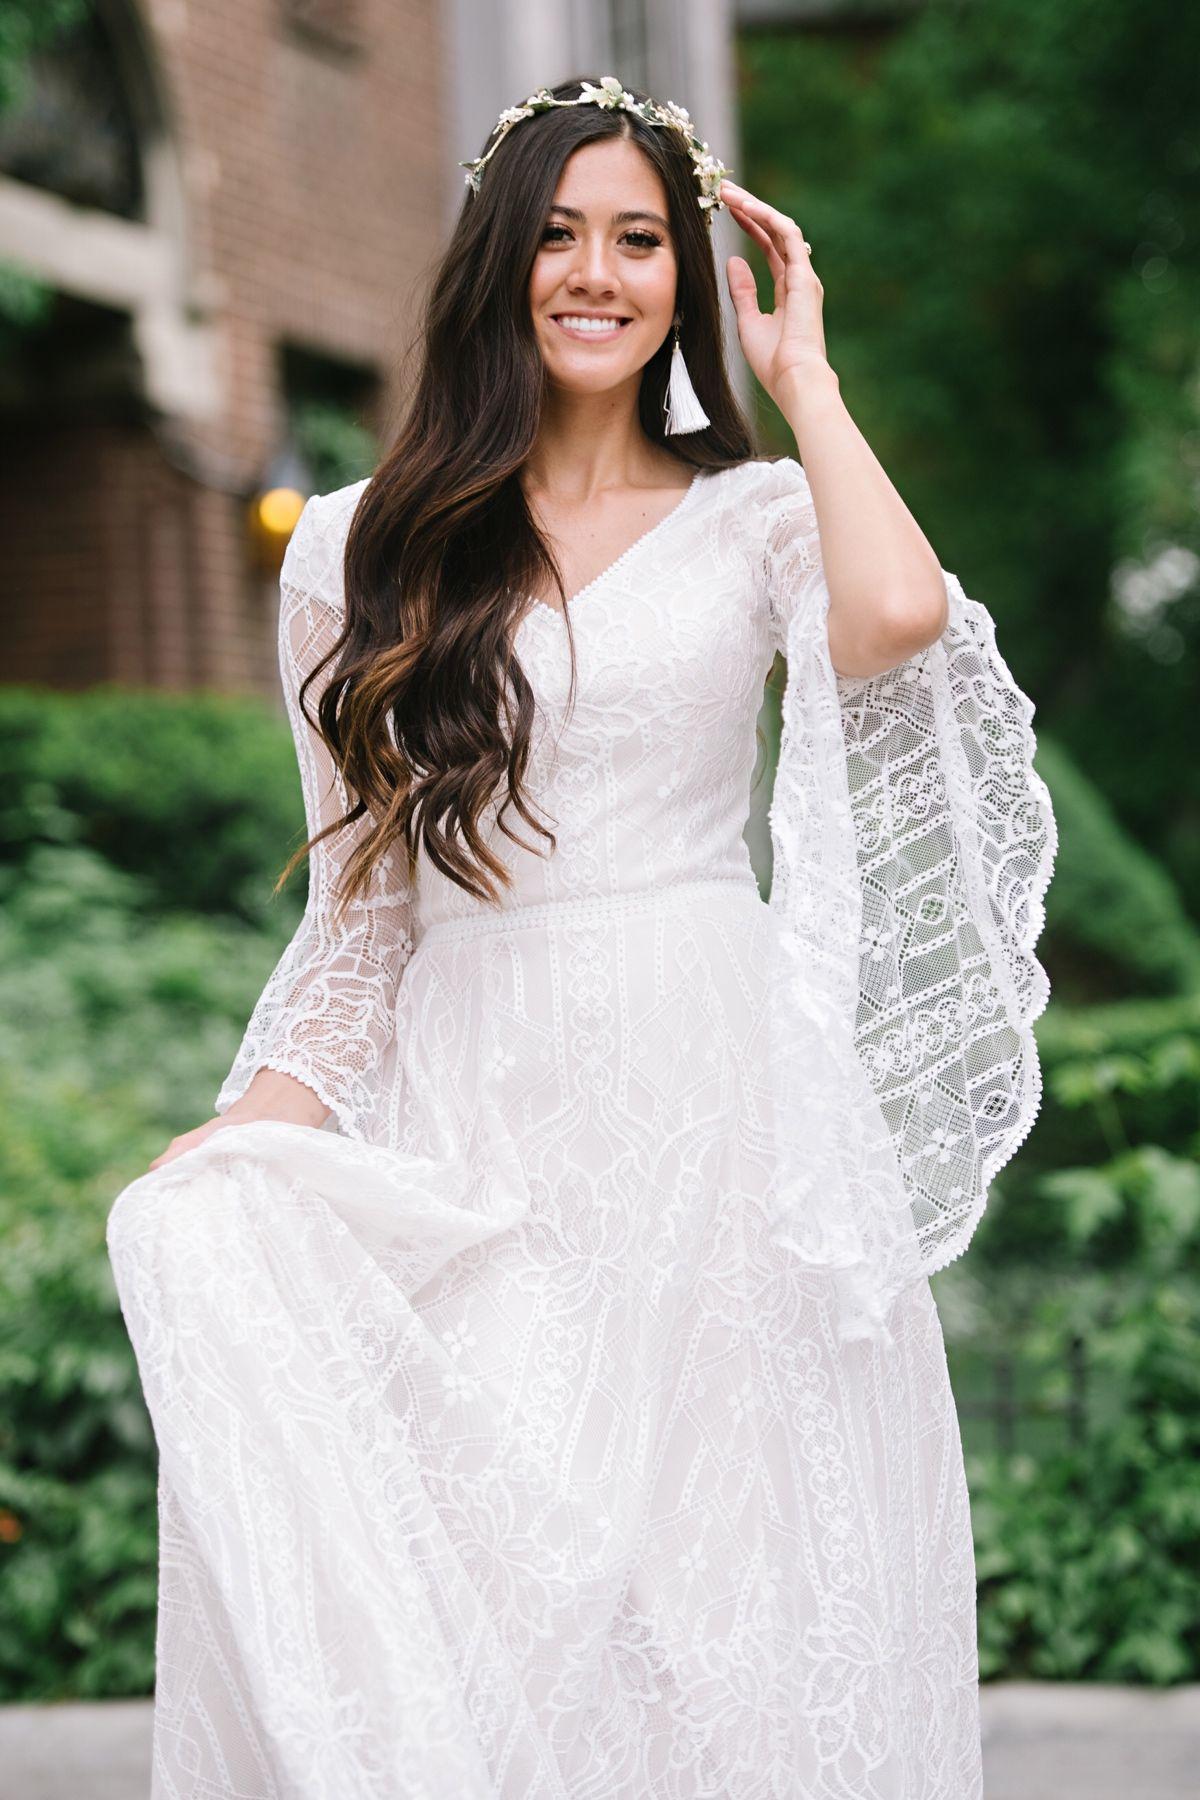 Arwen In 2021 Wedding Dresses Bell Sleeve Wedding Dress Blue Bridesmaid Dresses Short [ 1800 x 1200 Pixel ]